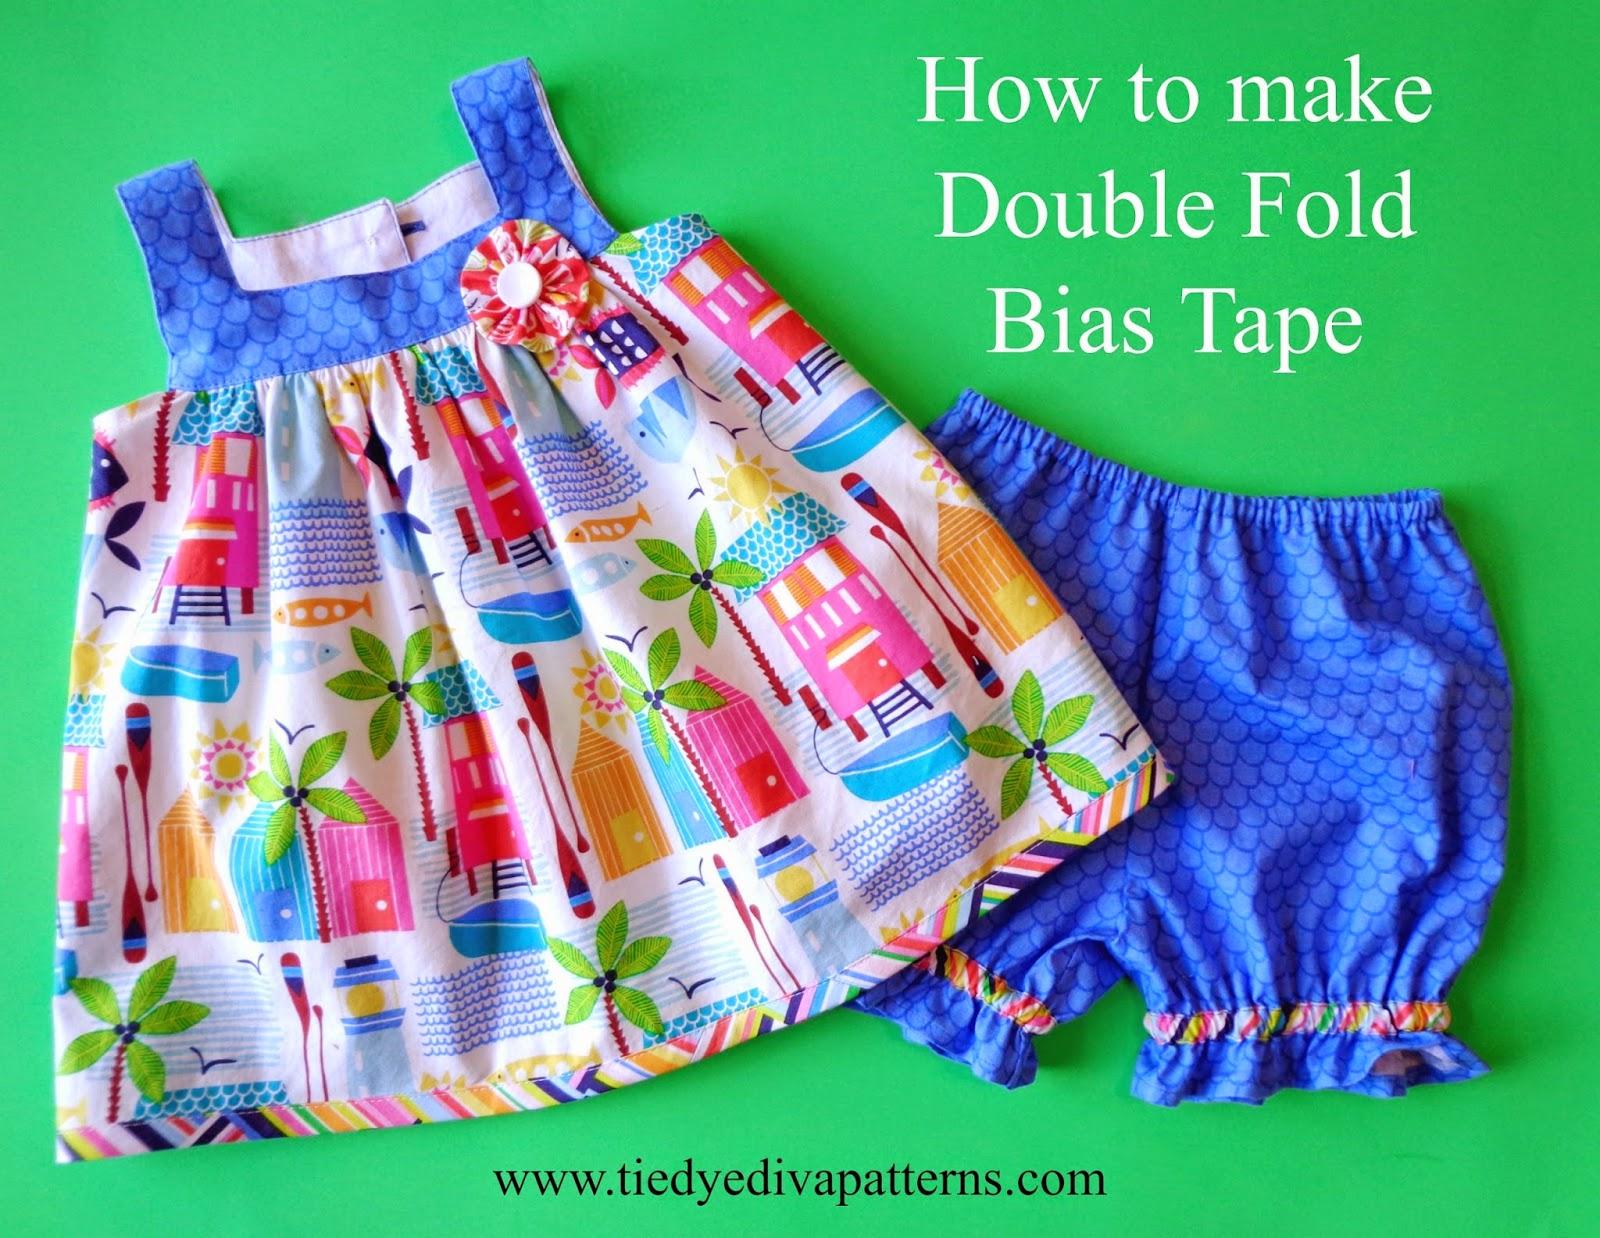 Tutorial tuesday how to make double fold bias tape tie dye diva tutorial tuesday how to make double fold bias tape baditri Gallery